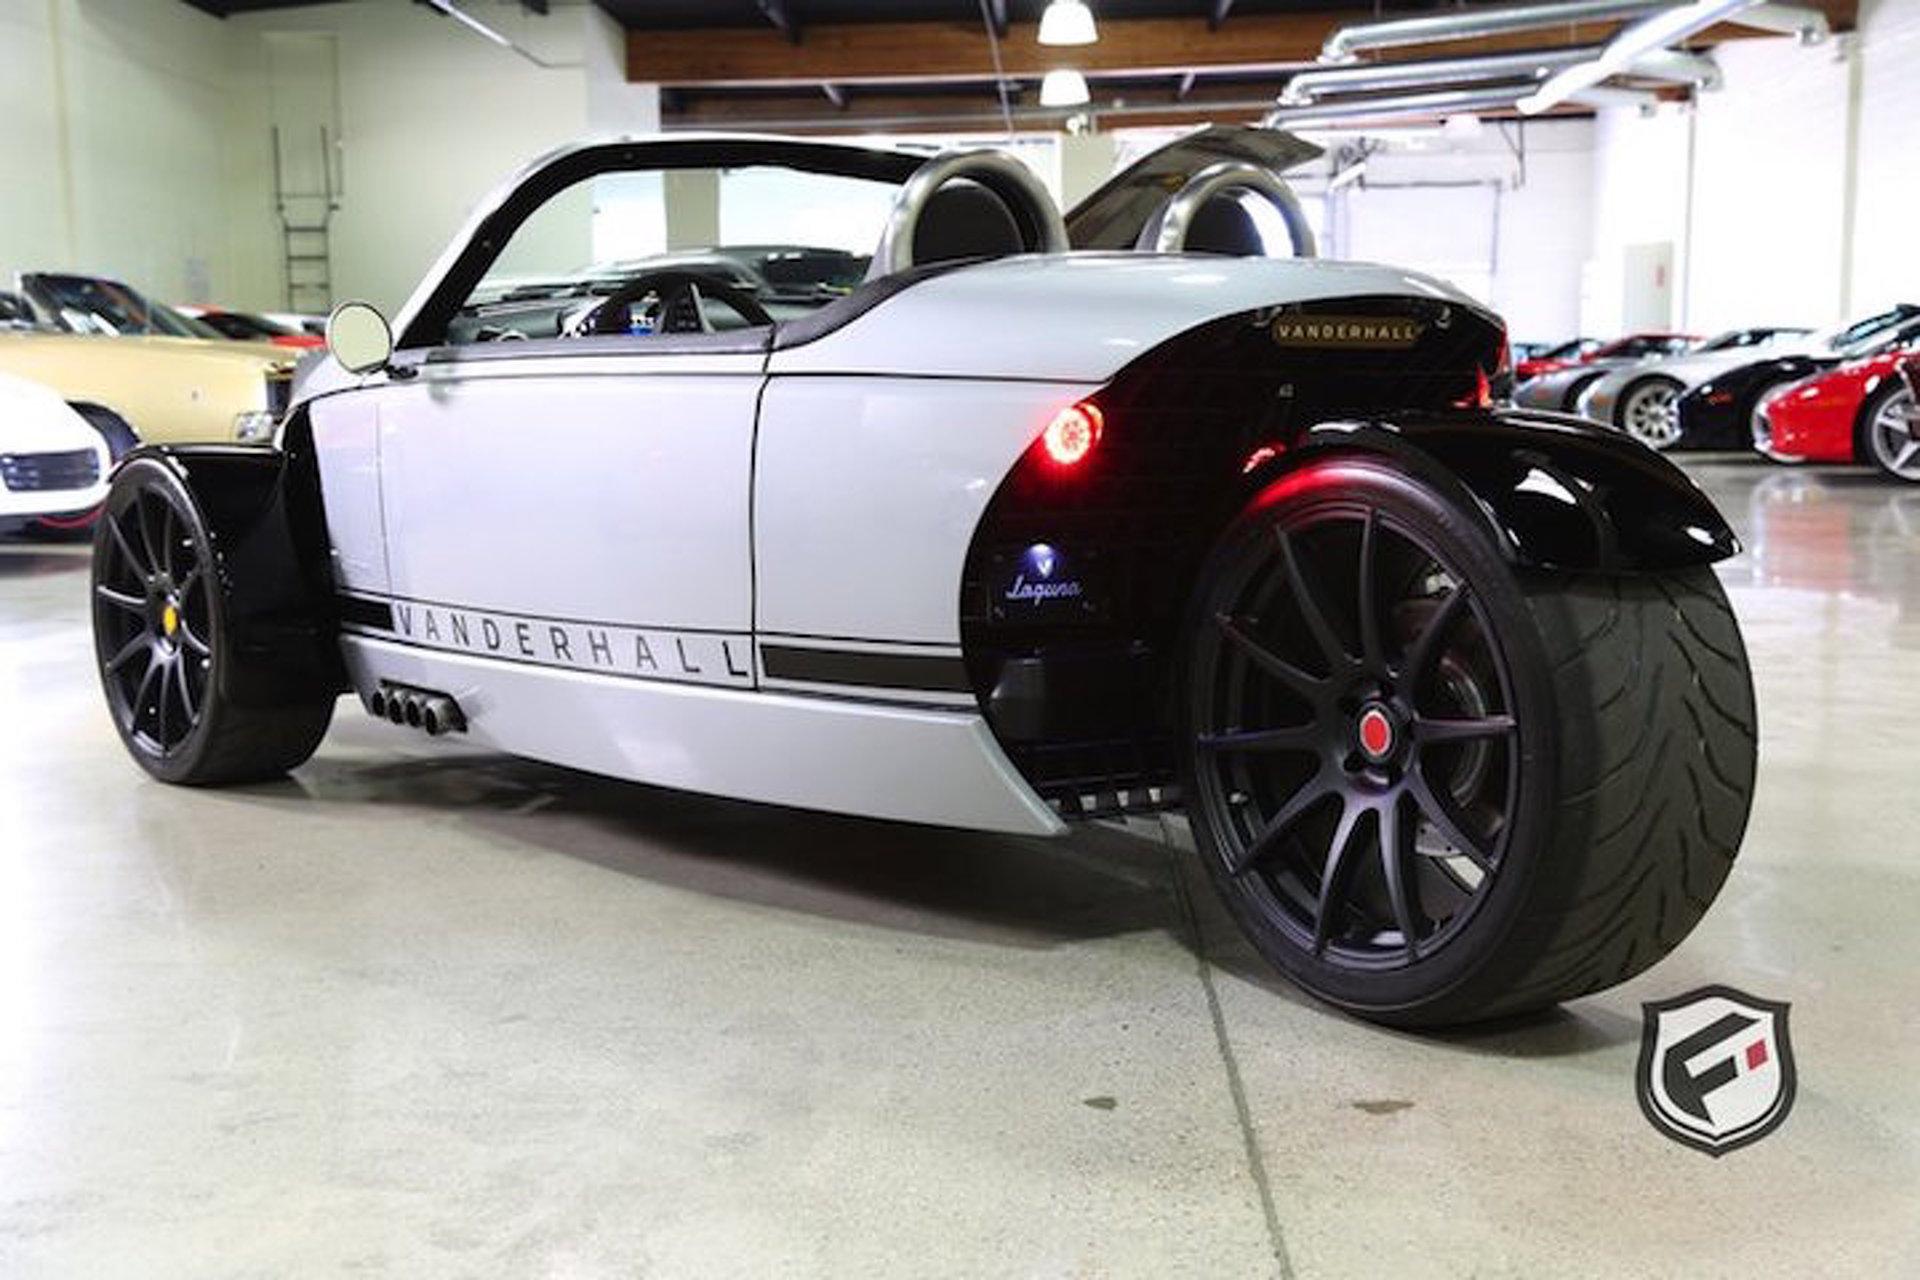 The Three-Wheeled Vanderhall Laguna is a Pricey Weekend Toy